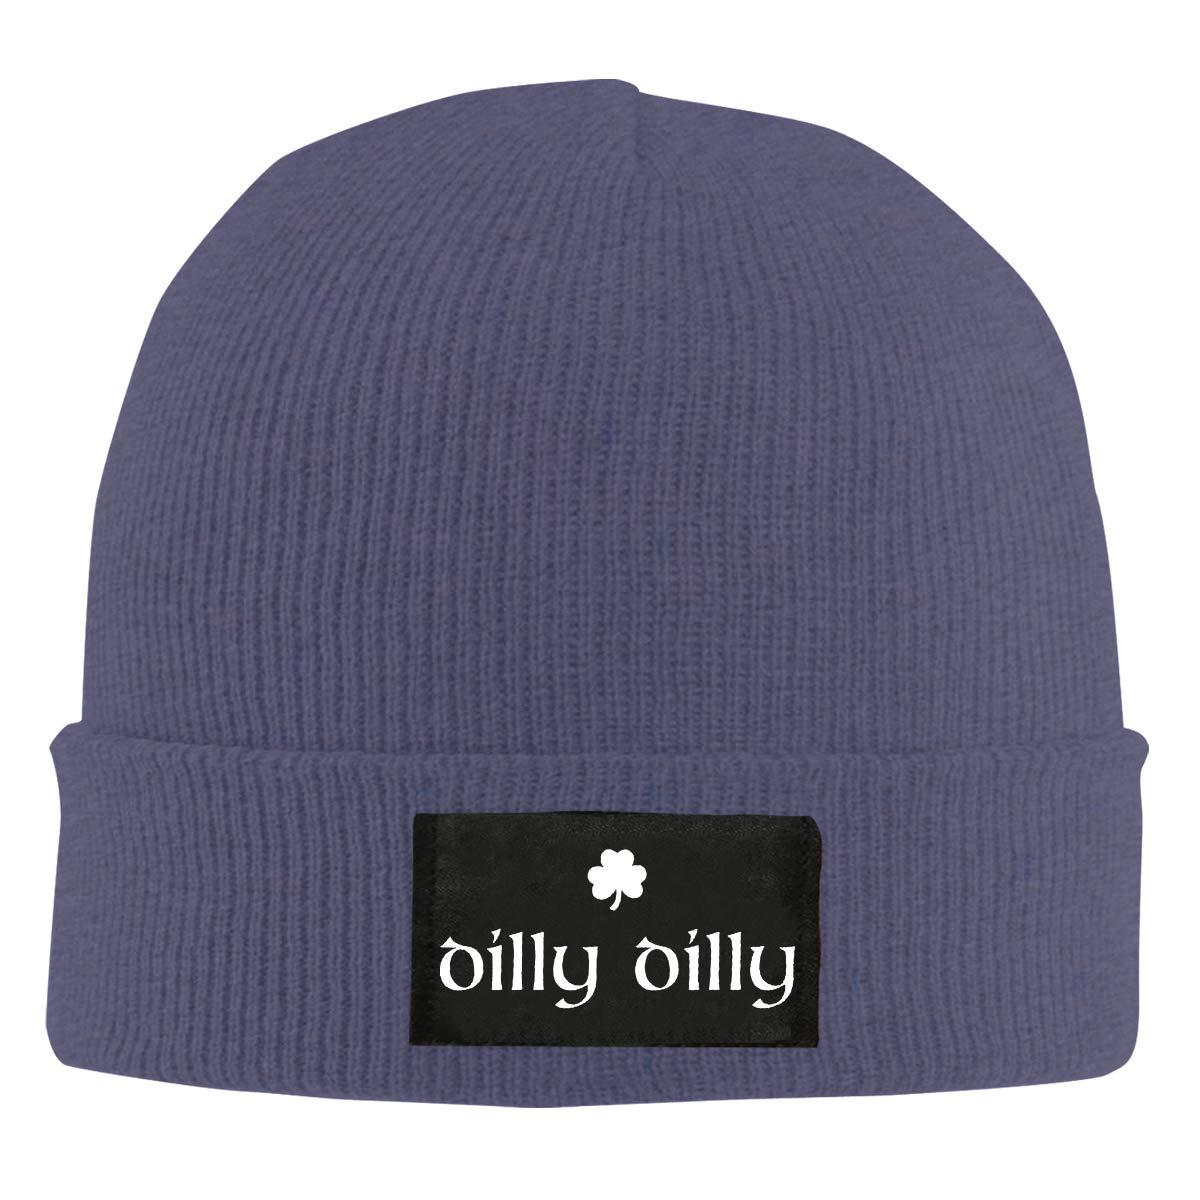 Dilly Dilly Logo Unisex Warm Winter Hat Knit Beanie Skull Cap Cuff Beanie Hat Winter Hats